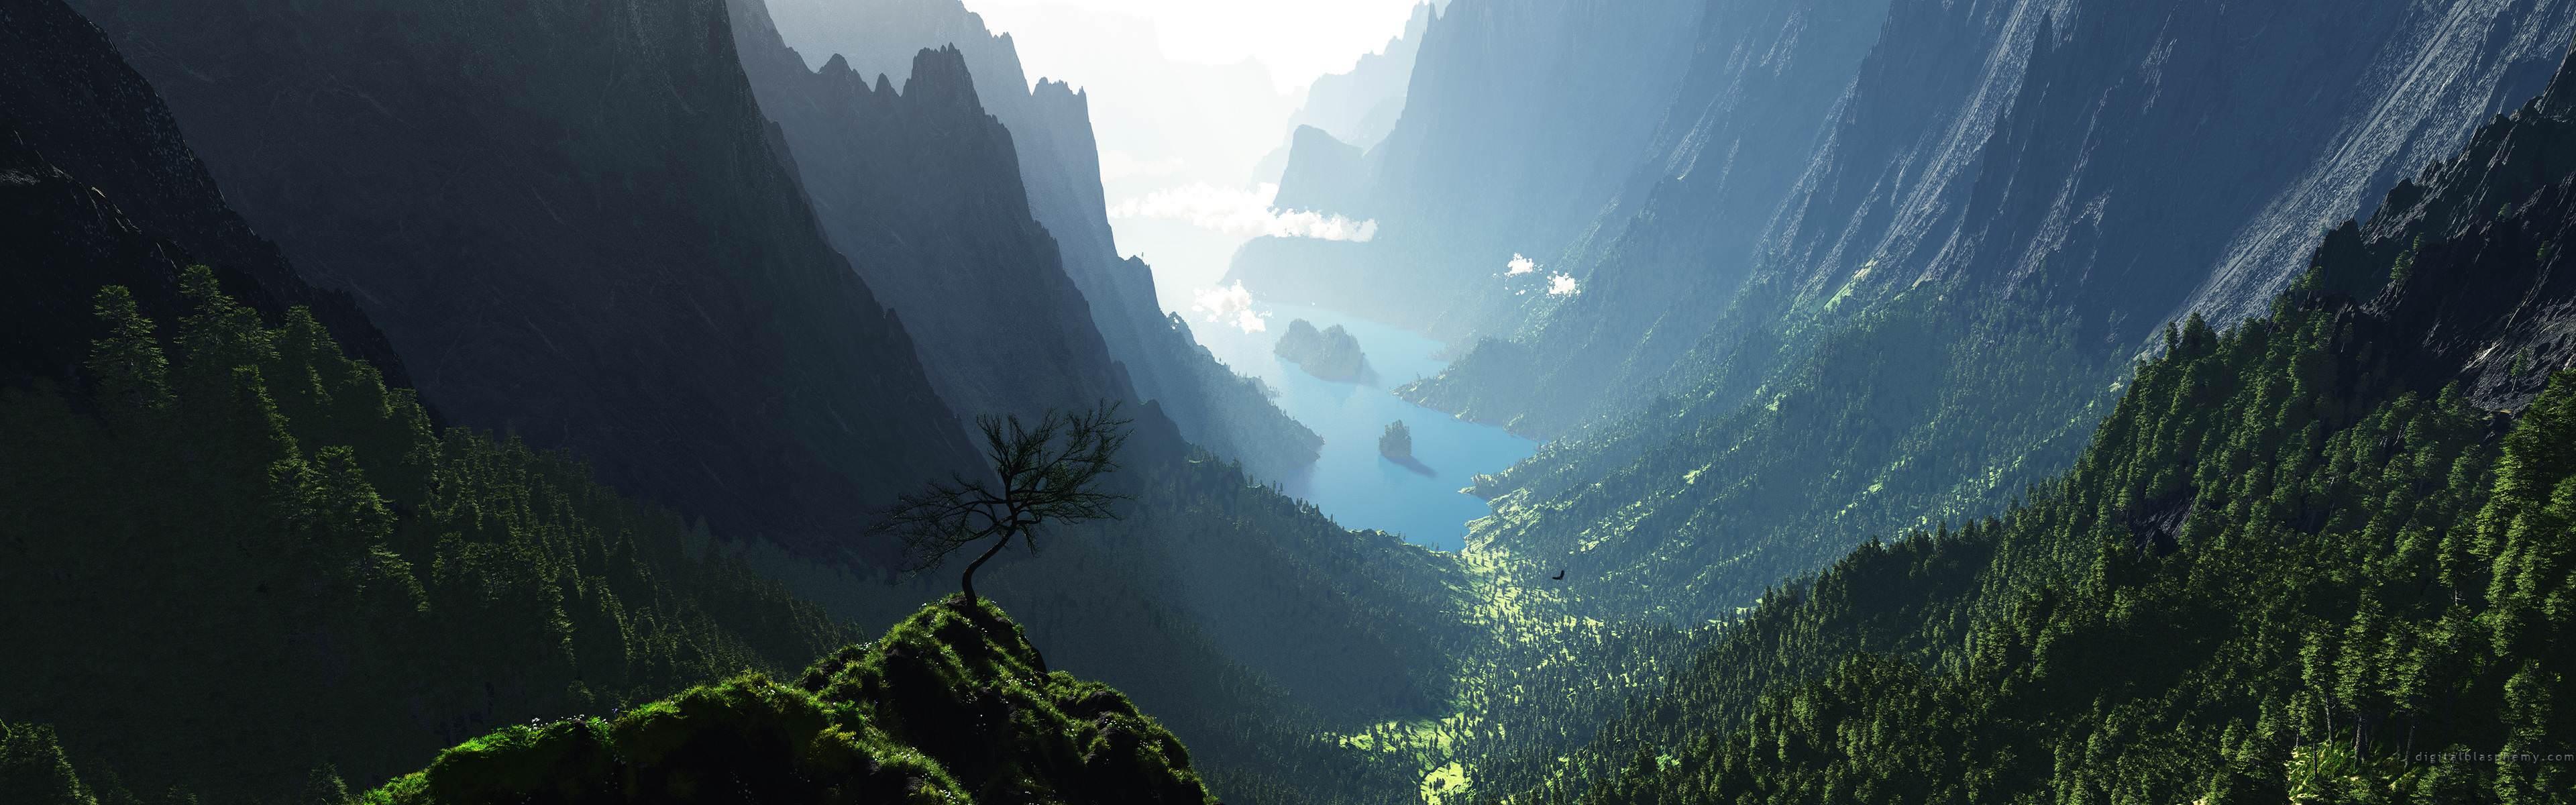 Valley [ 3840 x 1200 ]